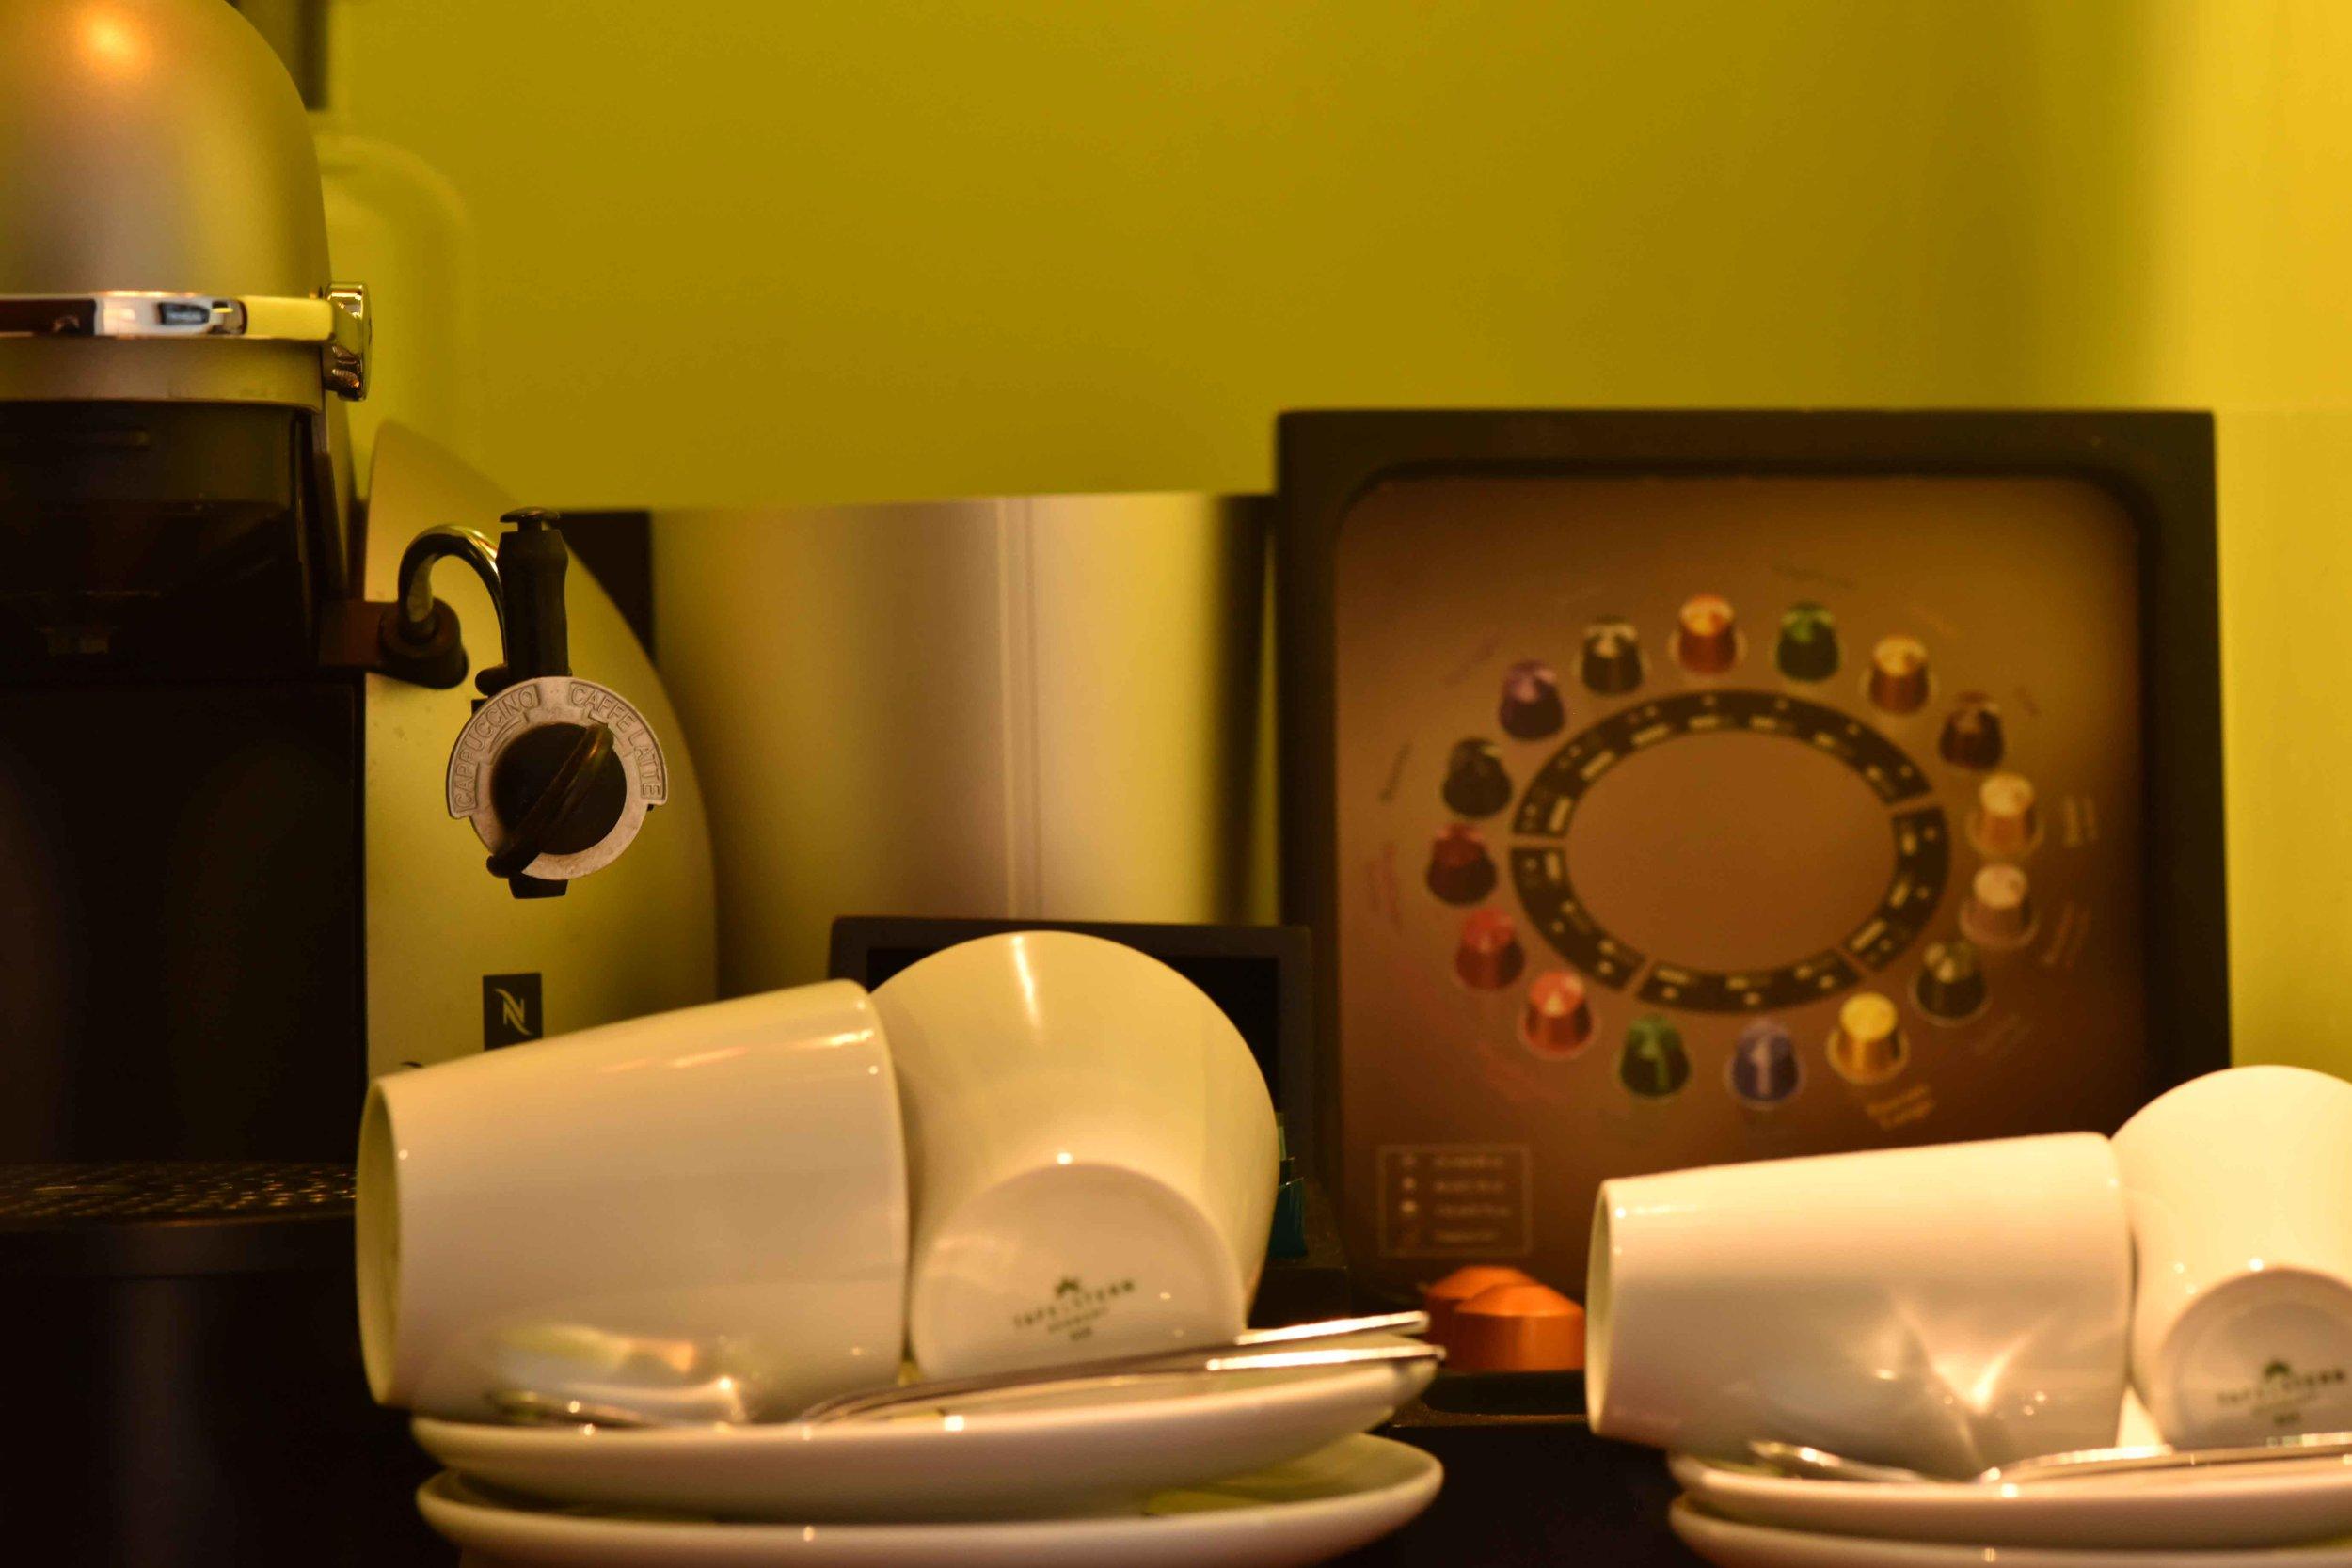 Nespresso machine, superior room with canal view, Sofitel Legend Amsterdam The Grand. Image©thingstodot.com